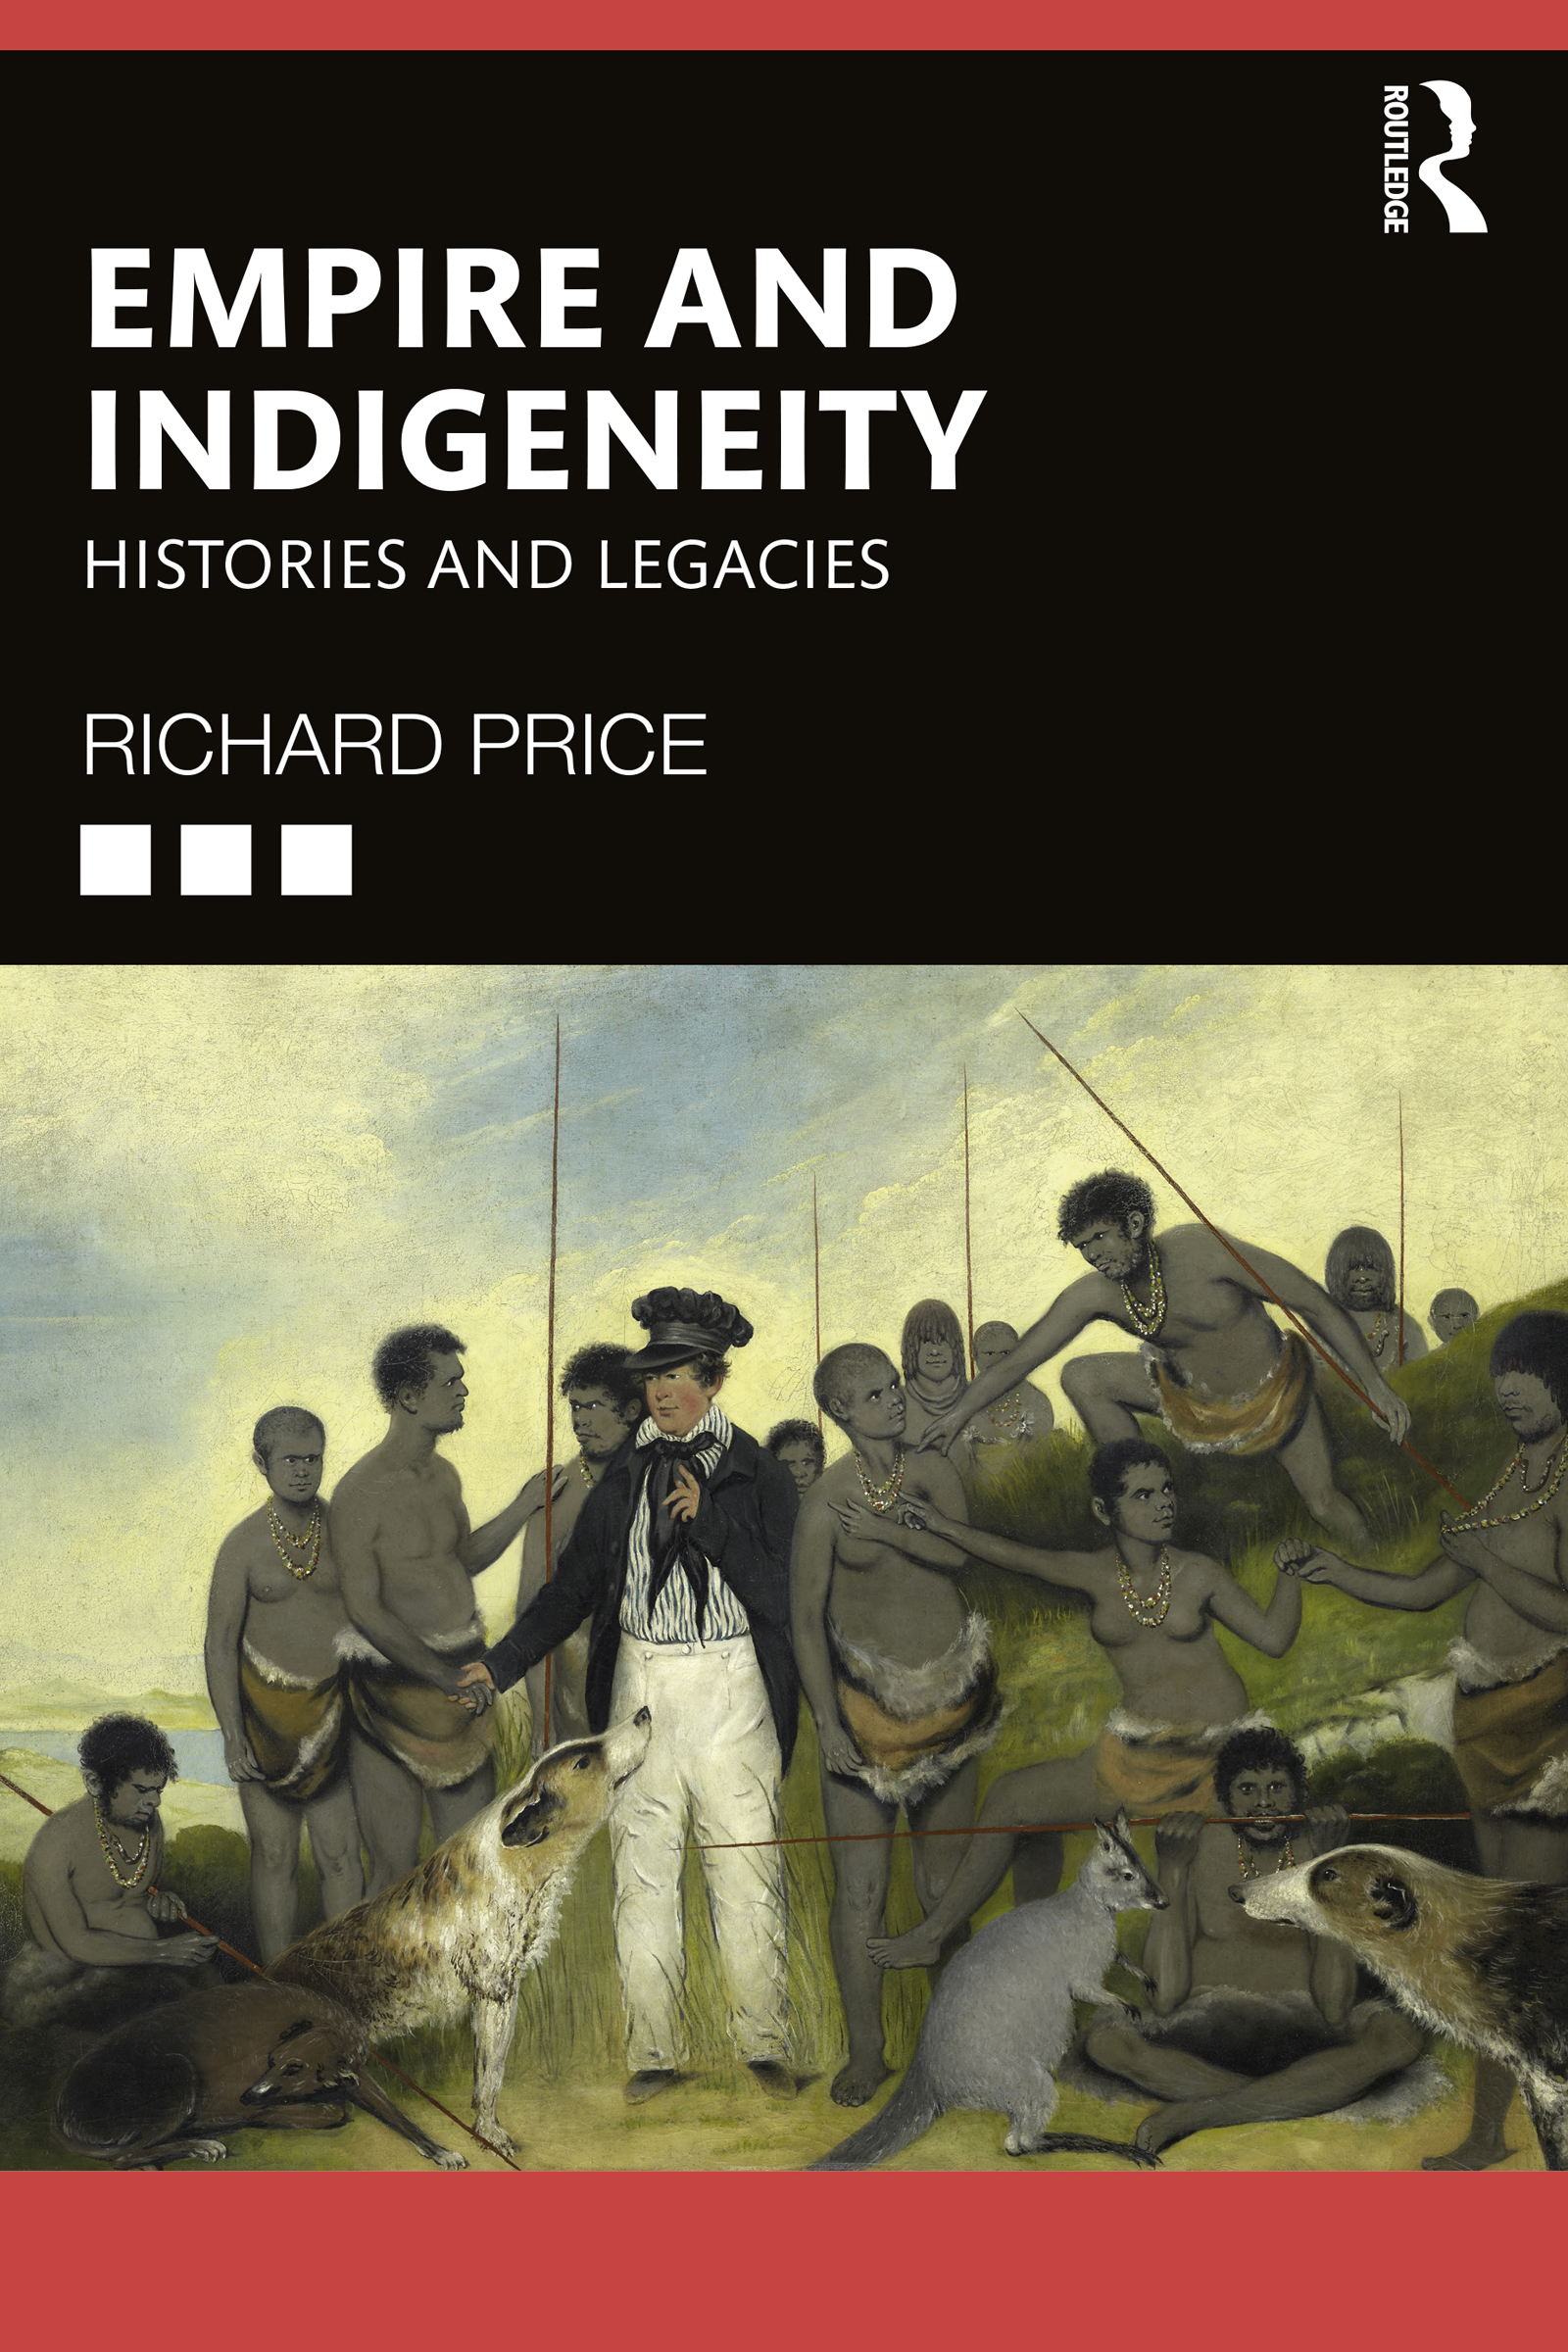 Legacies in modern Indigenous politics